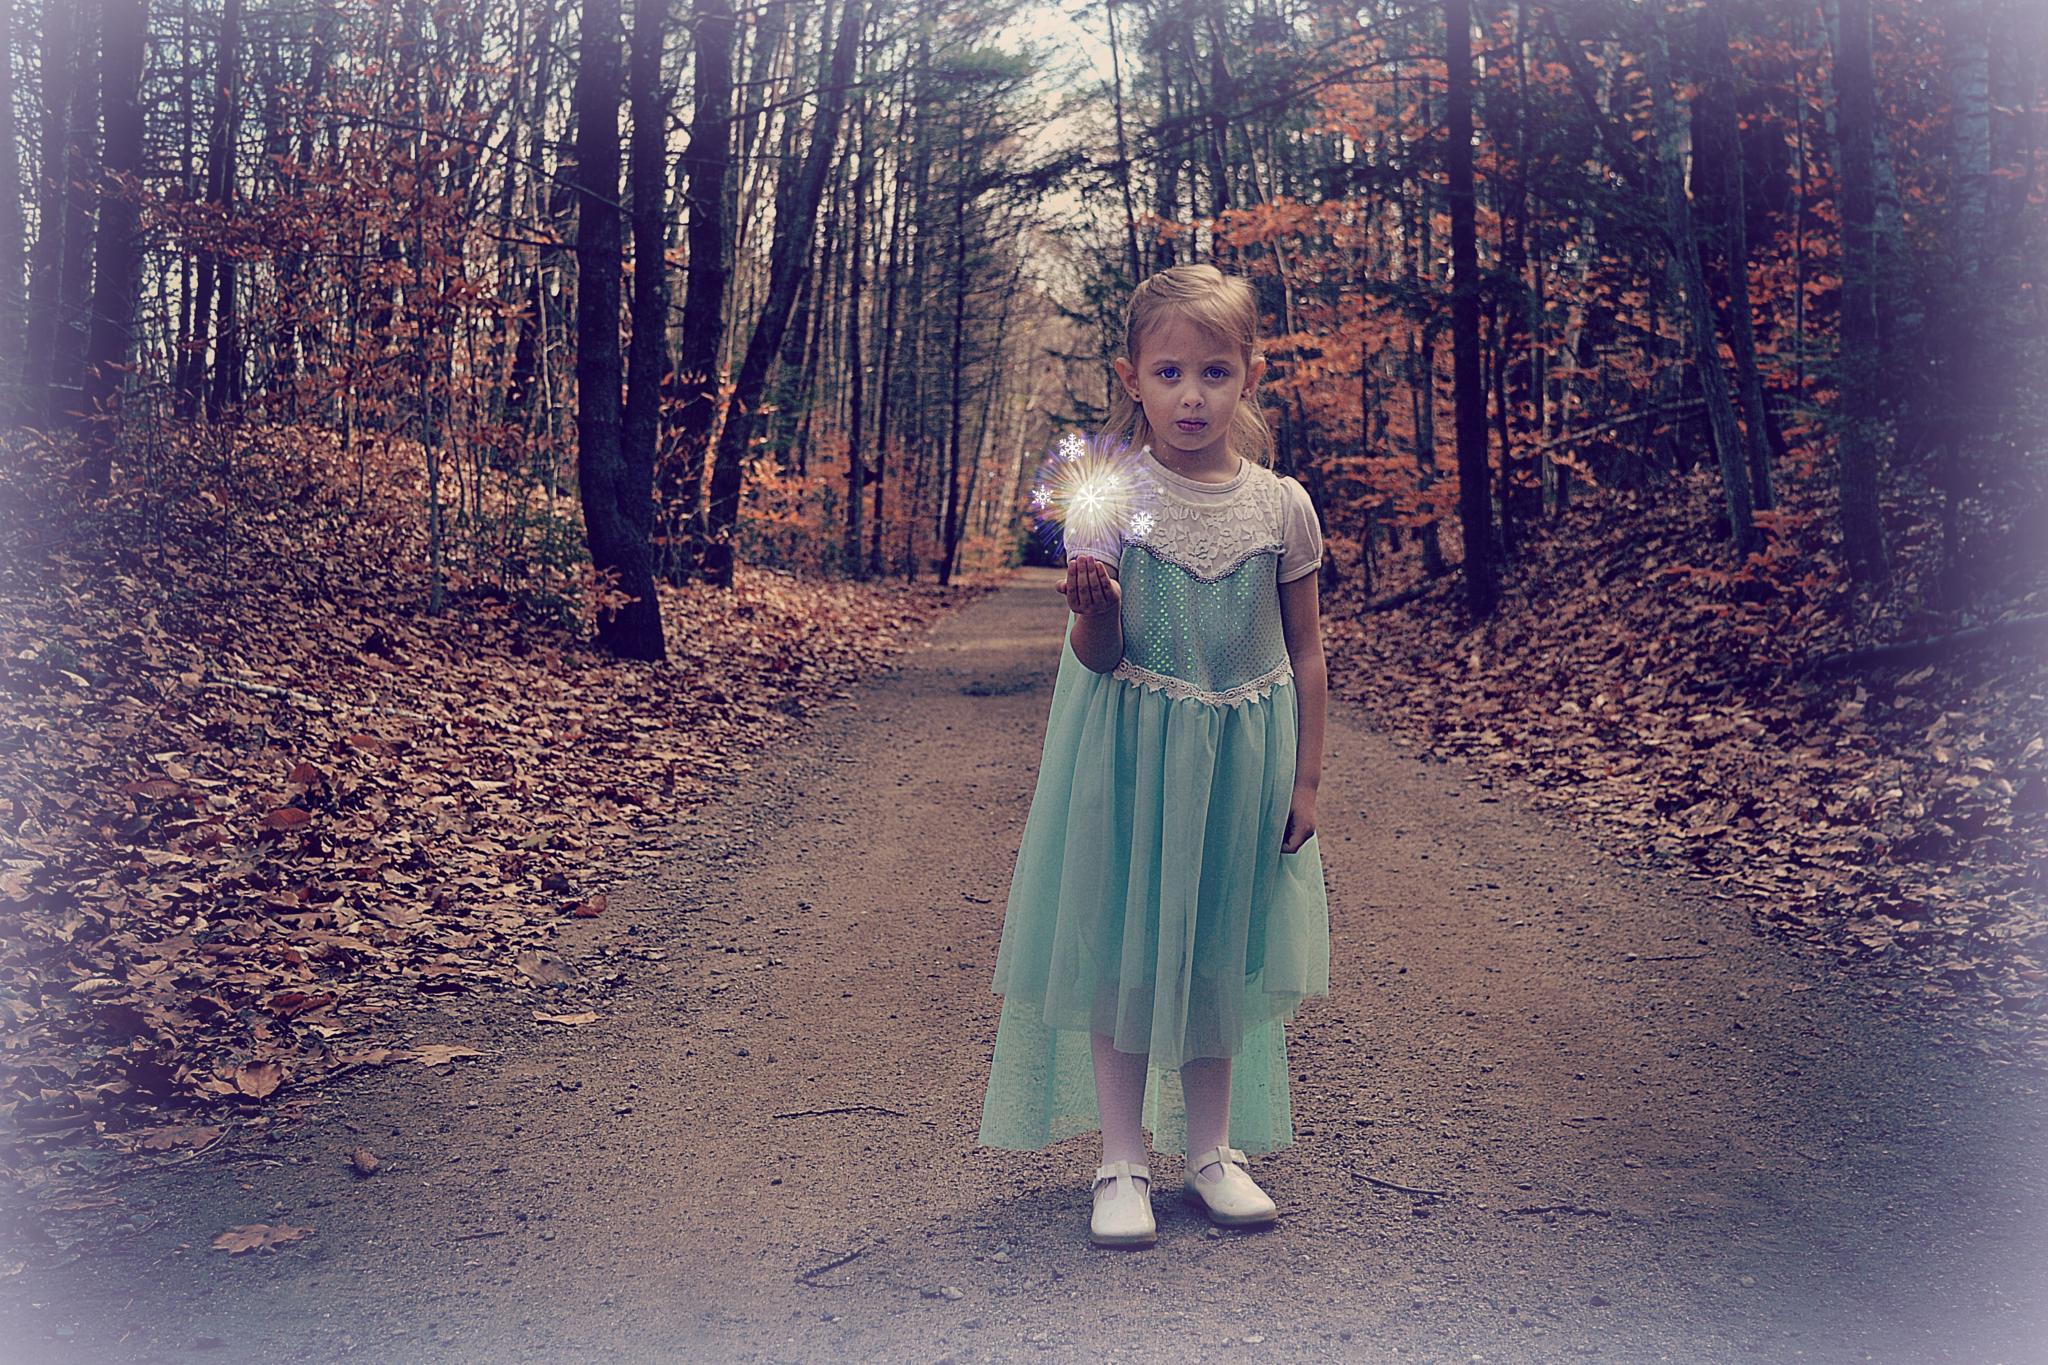 Our little Elsa by Jenn O'Hara